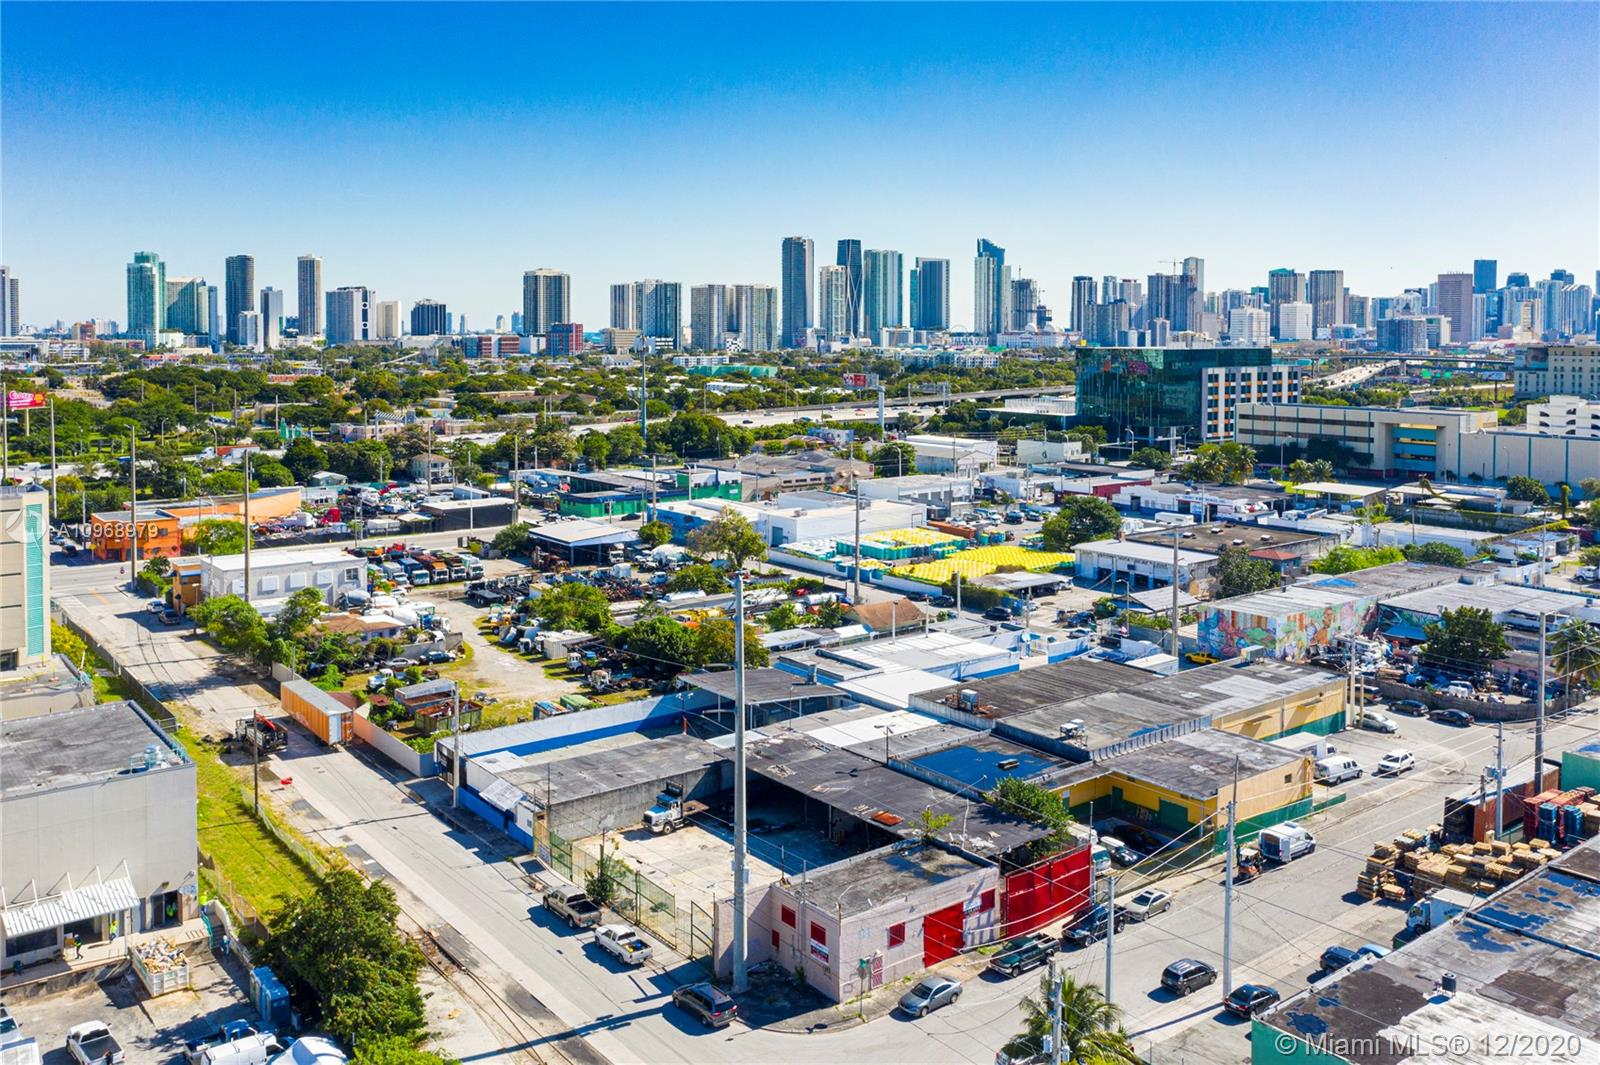 790 NW 22nd St, Miami, FL 33127